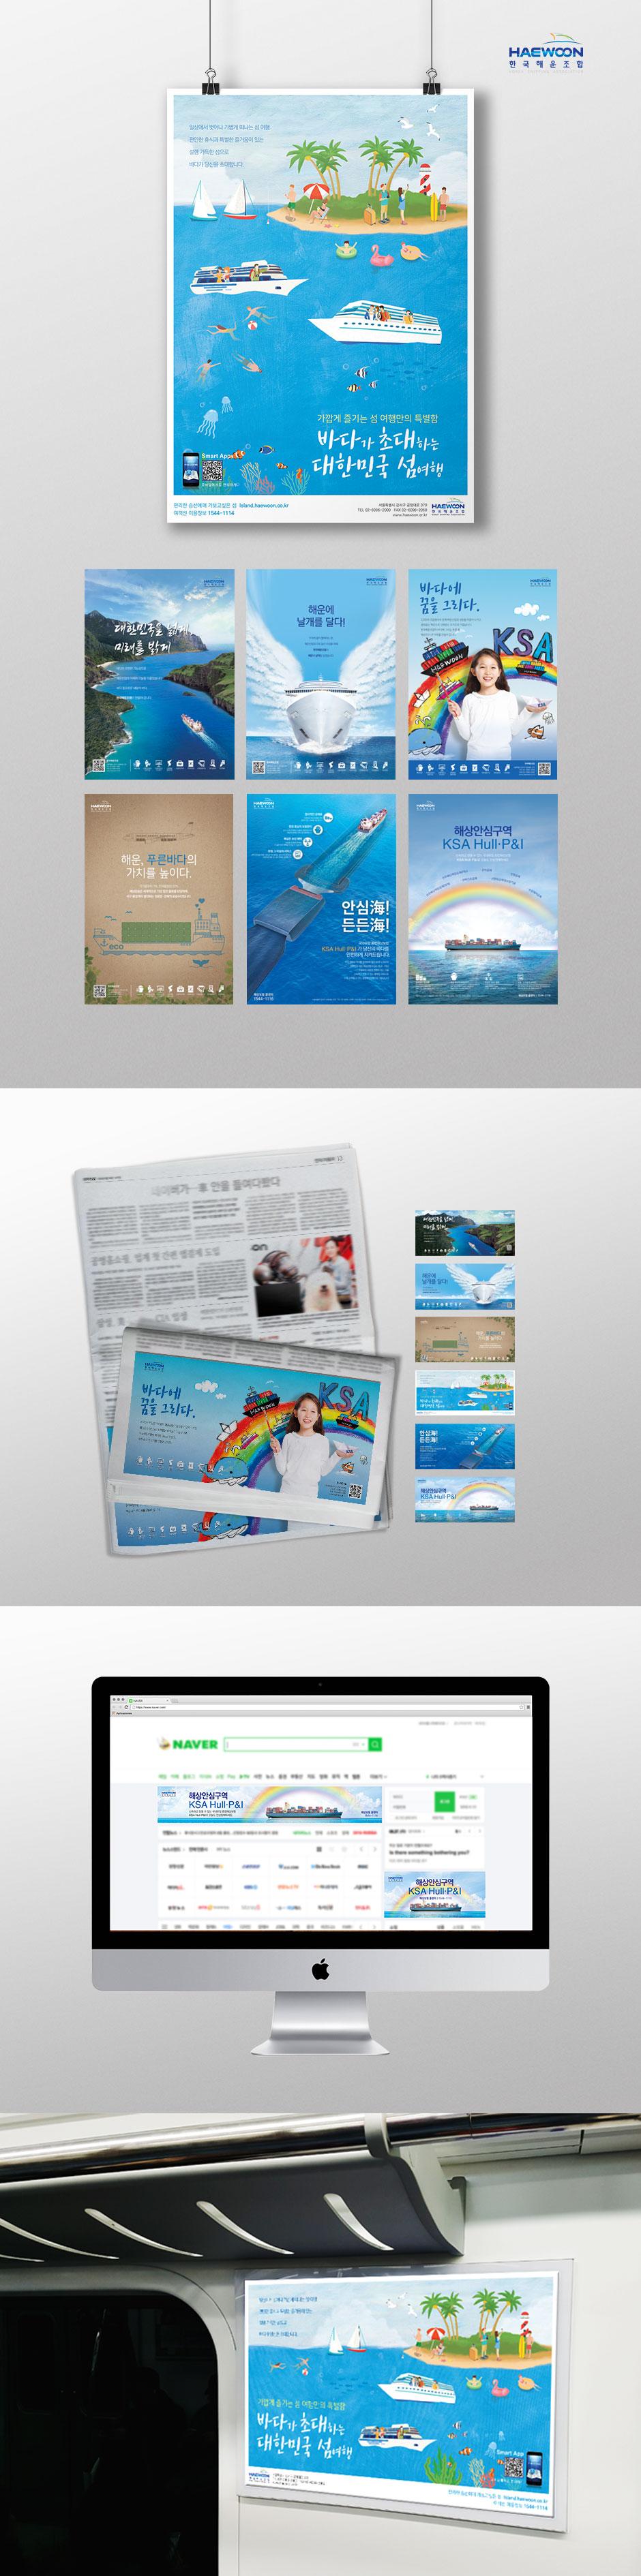 2018_HAEWOON_Paper advertisement